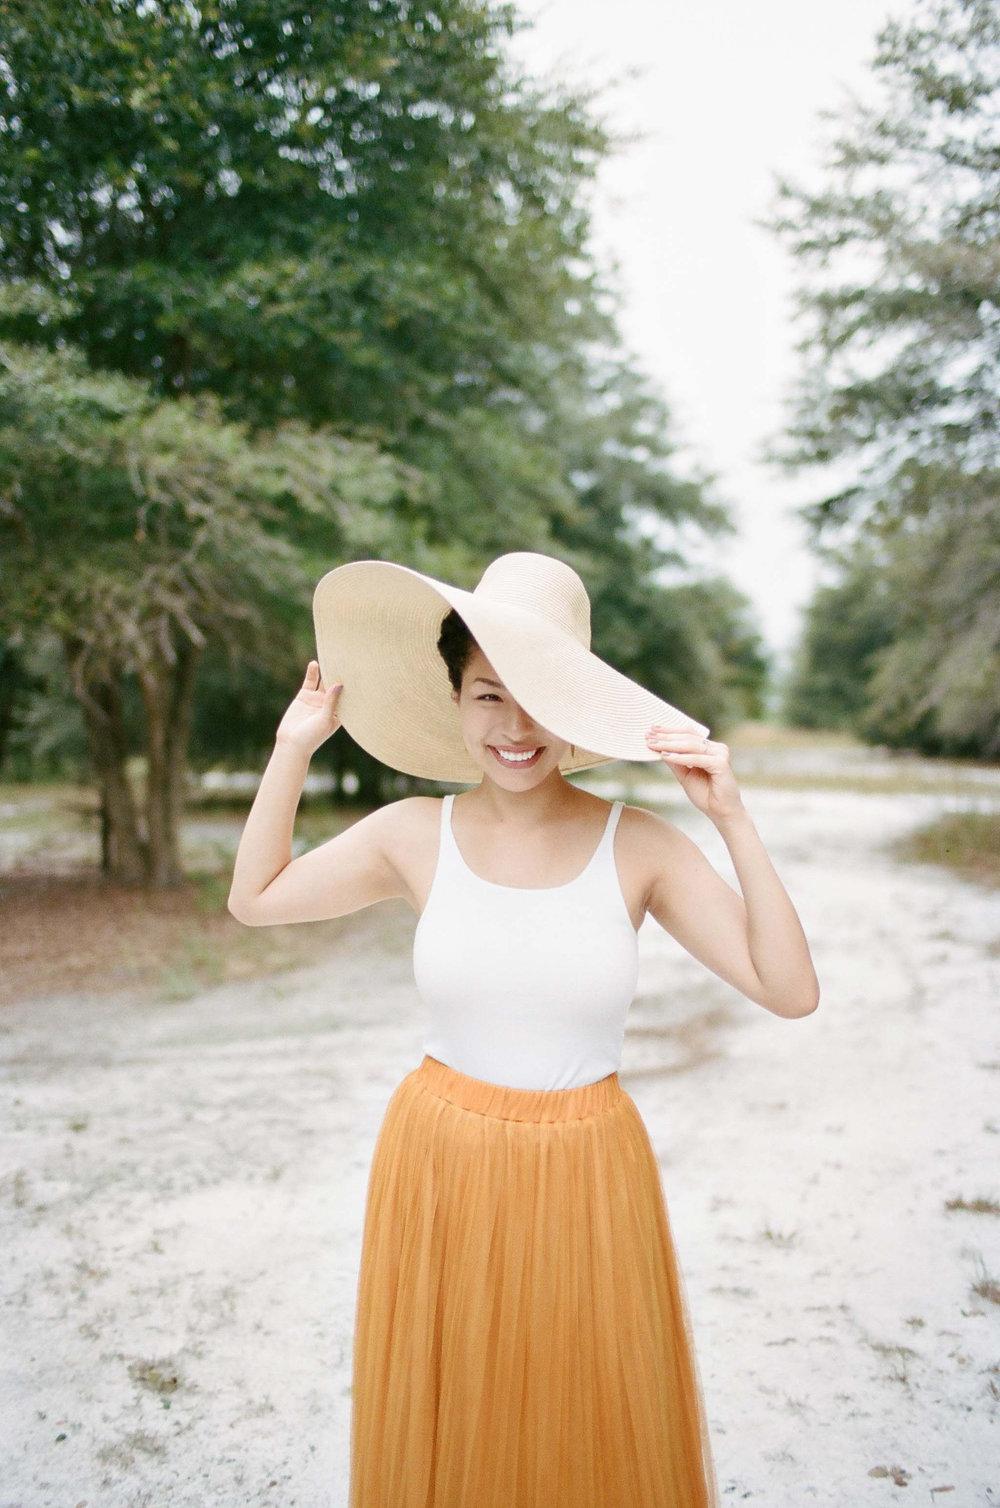 Catherine in Florida